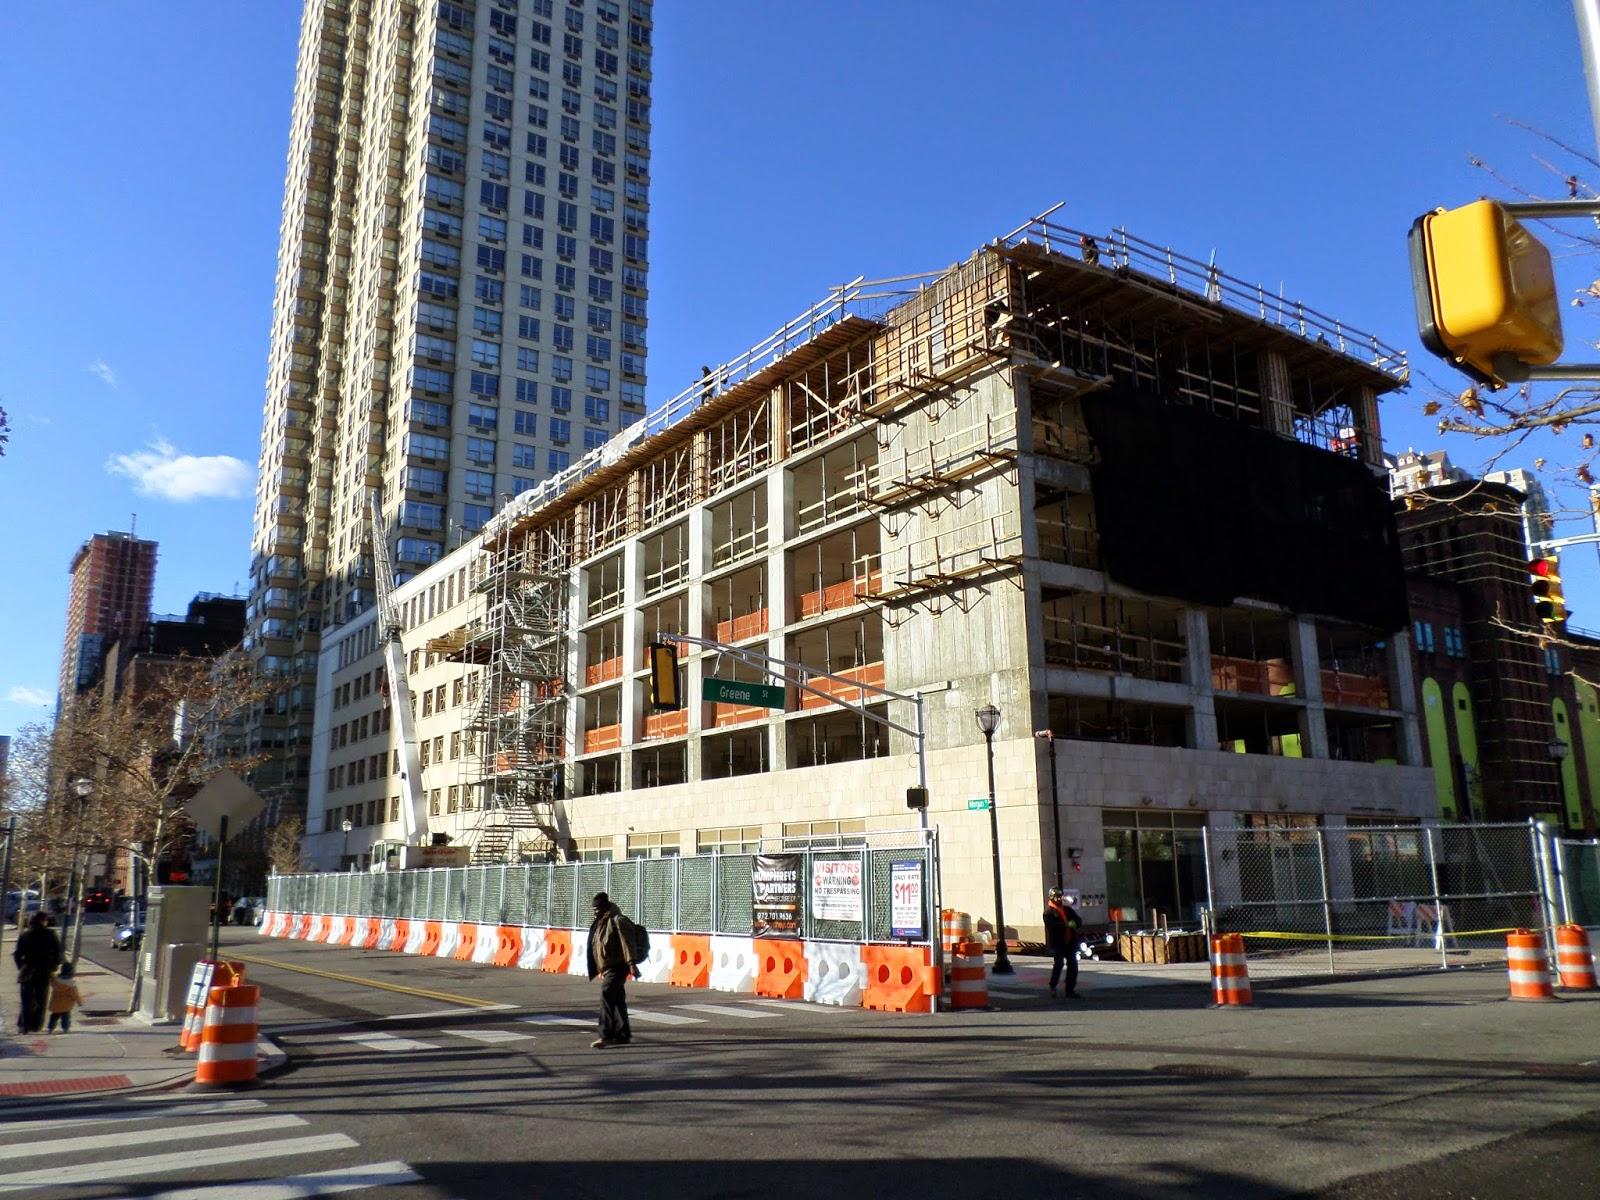 Newark jersey city and new york city 11 21 2014 for Trump plaza new york city